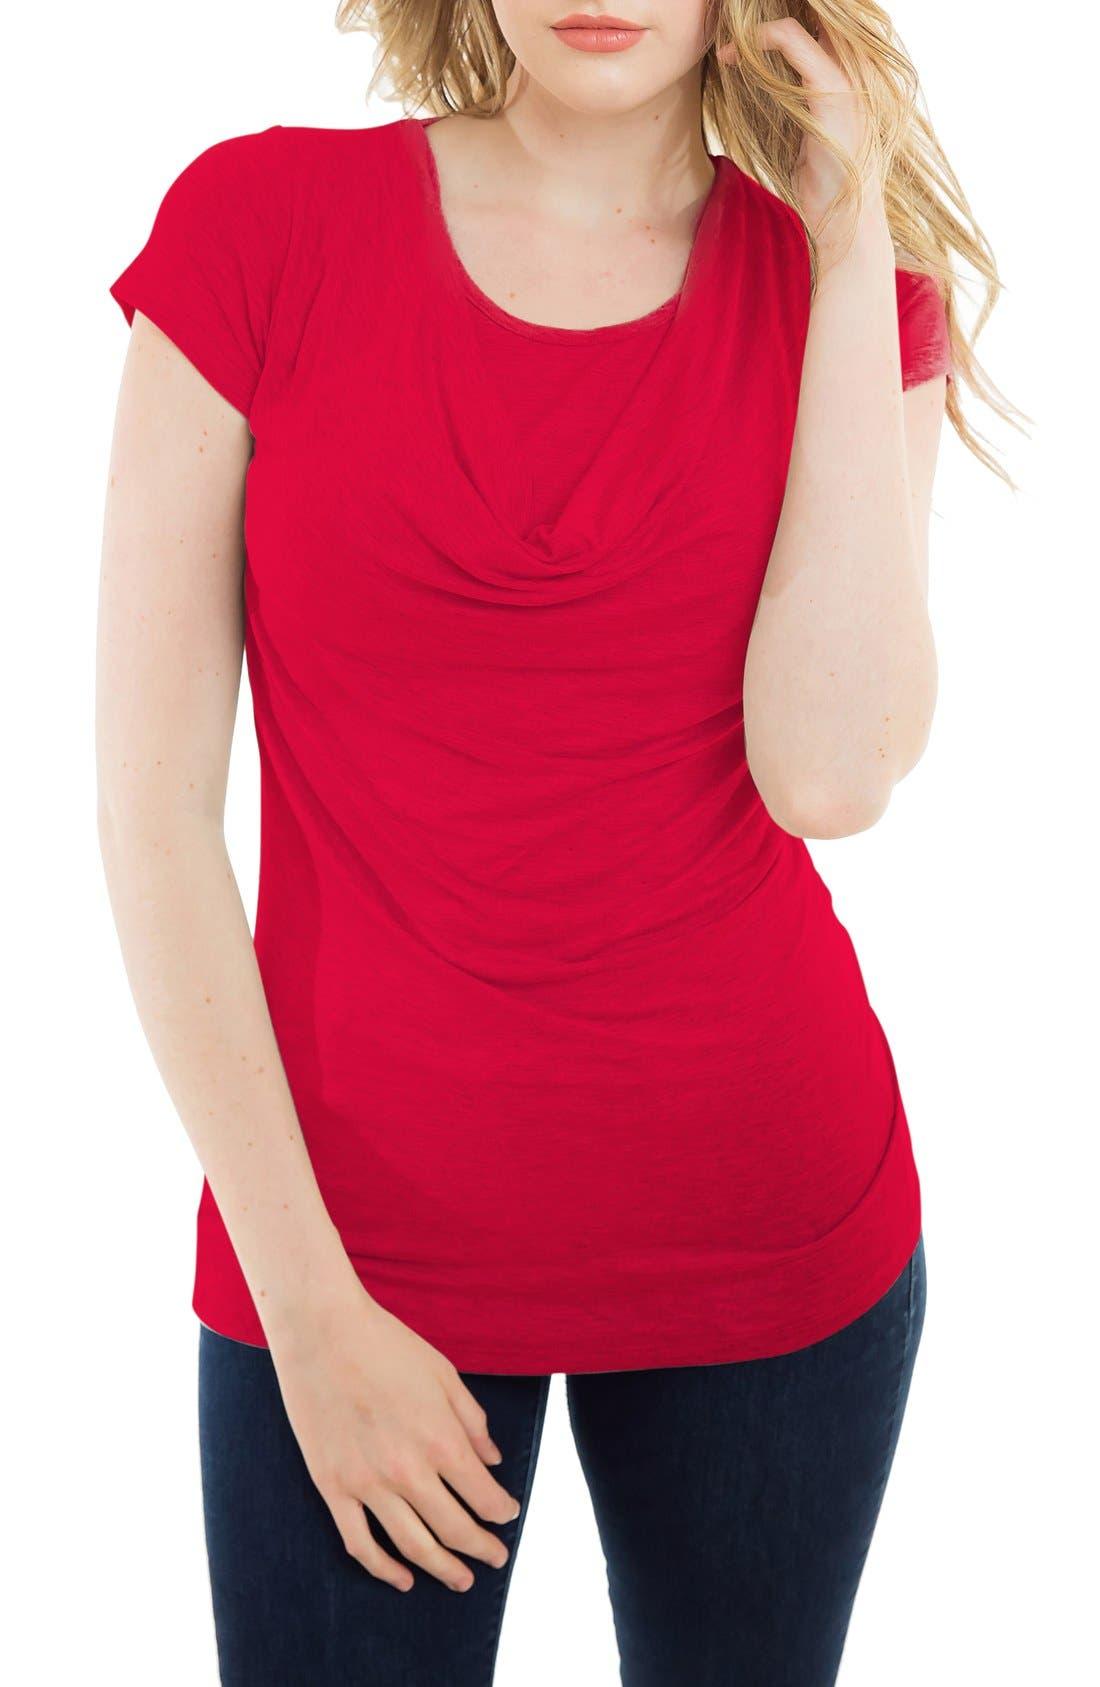 Nurture-Elle Cowl Neck Short Sleeve Nursing Top